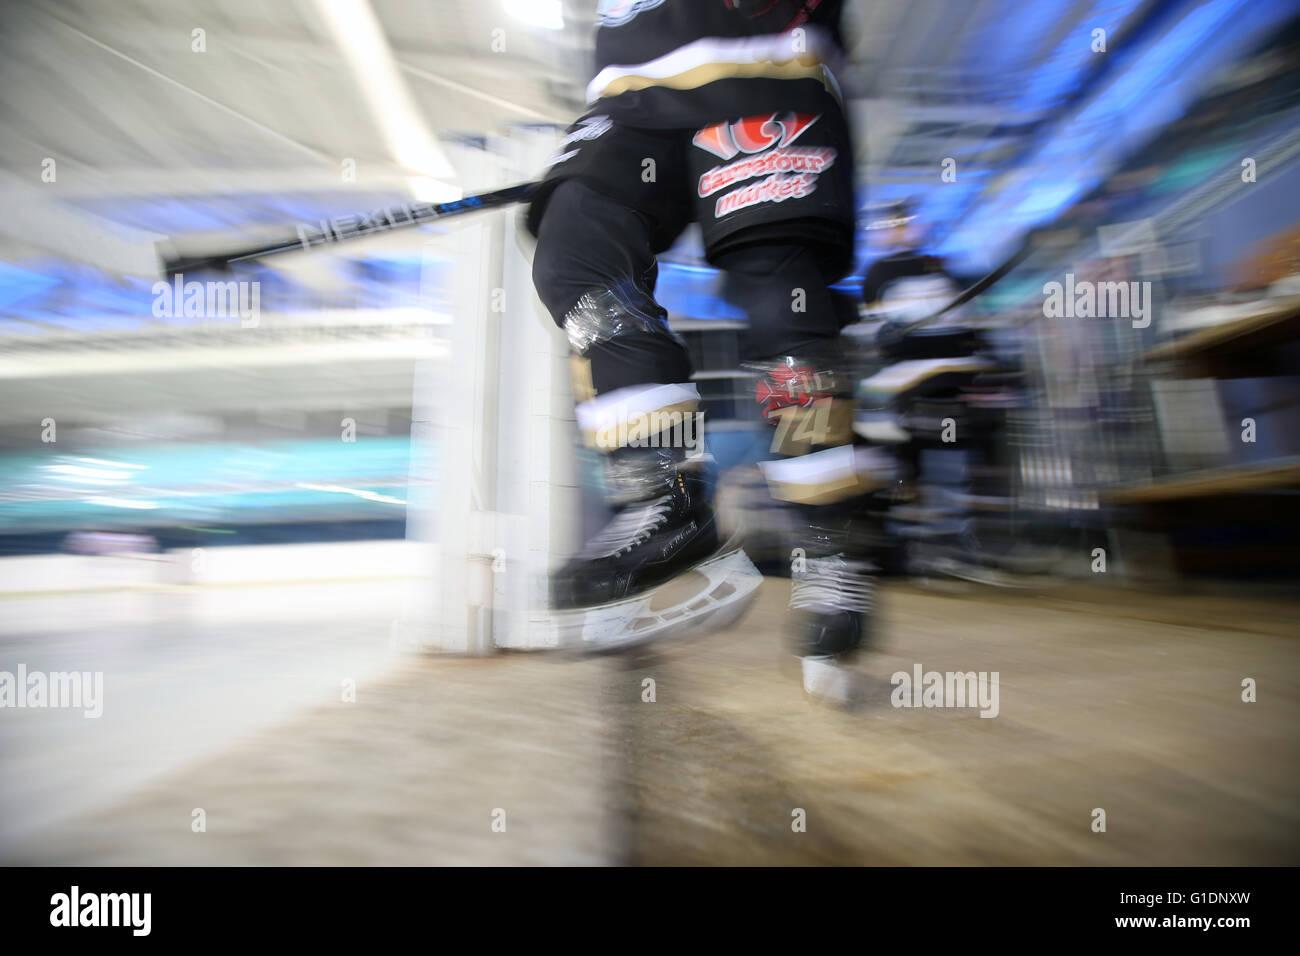 Ice Hockey match.  Mont-Blanc vs Amiens.  Saint-Gervais-les-Bains. France. Stock Photo